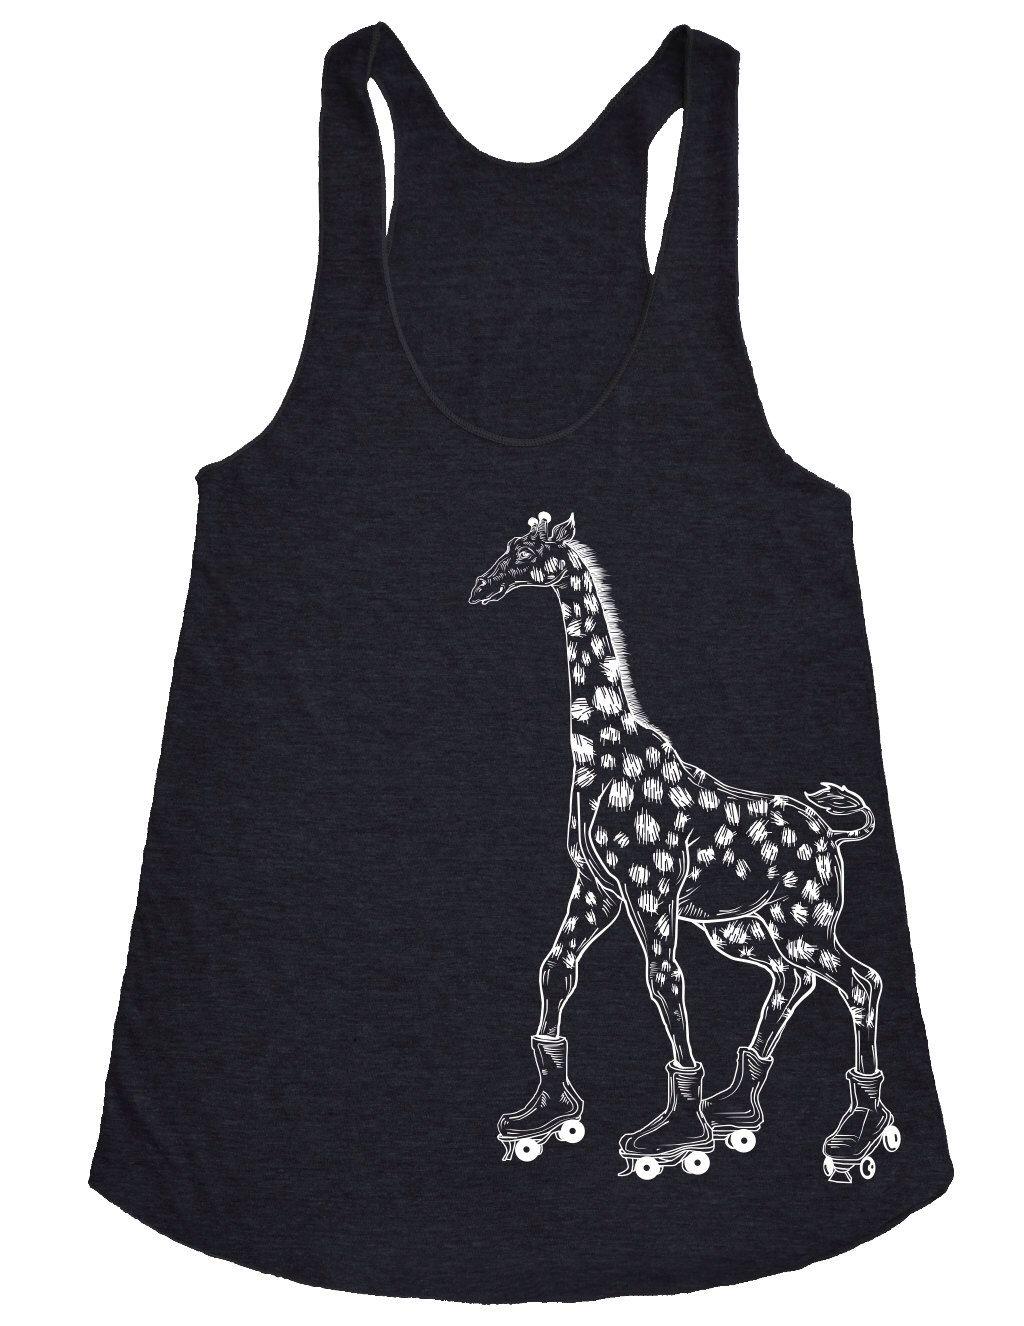 Funny Roller Skating Giraffe Tank Top Printed On Bella Canvas Tri Blend Womens Triblend Racerback Tank Tri-blend